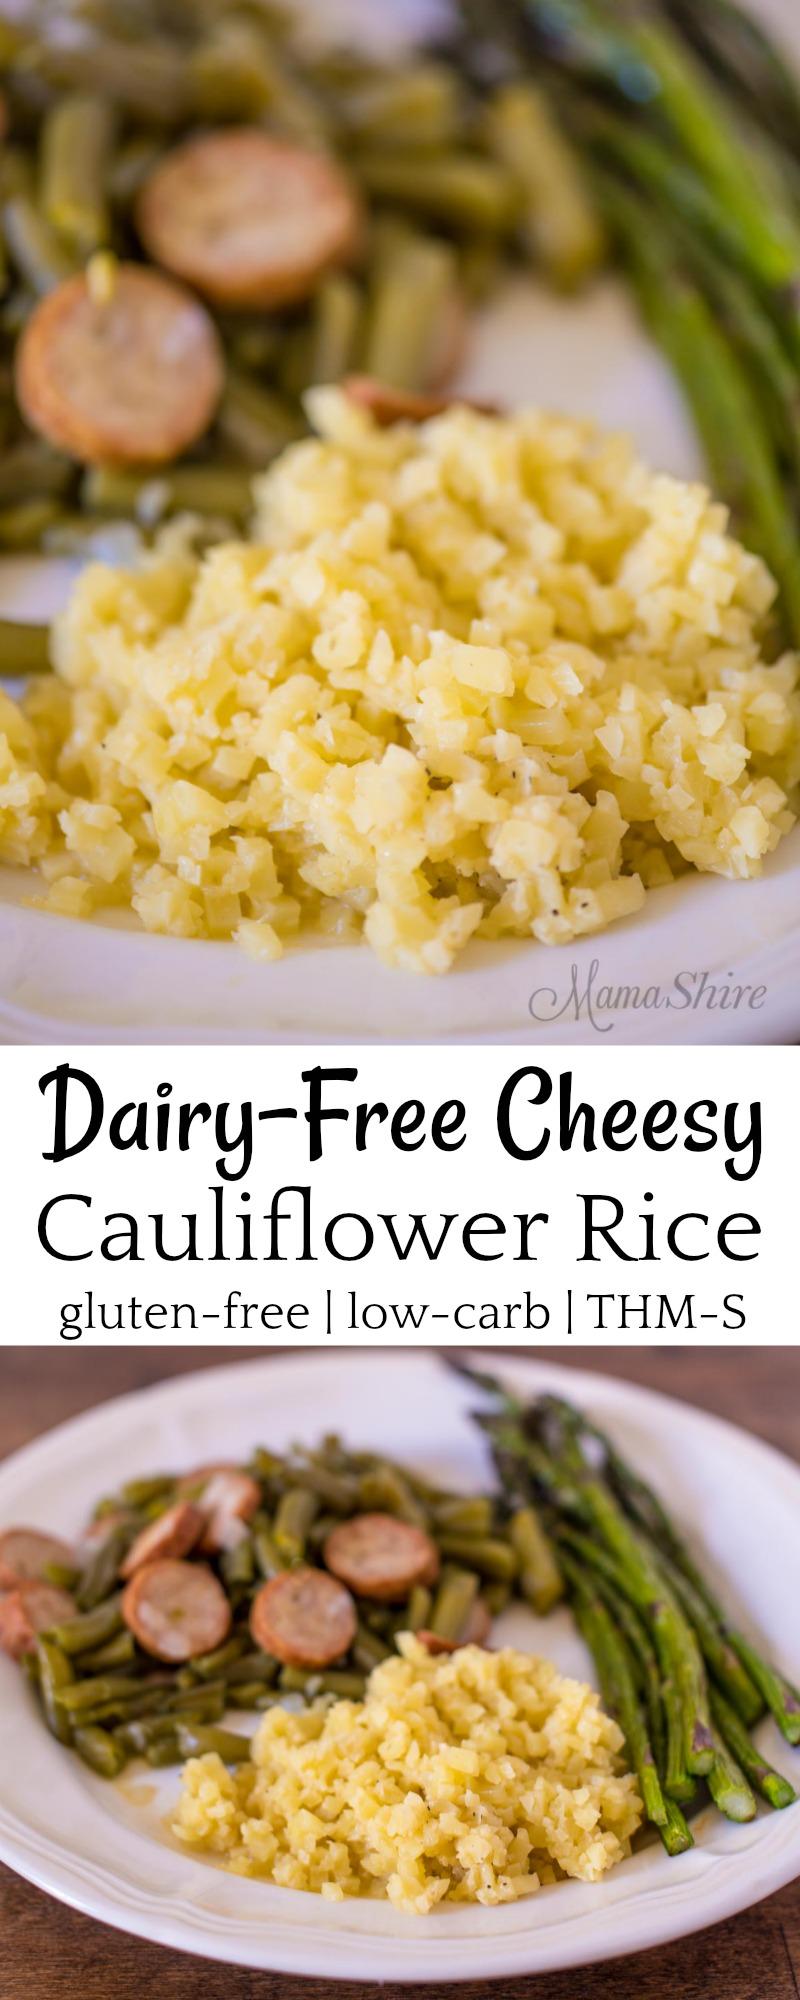 Dairy-Free Cheesy Cauliflower Rice - Gluten-free, Low-carb, THM-S